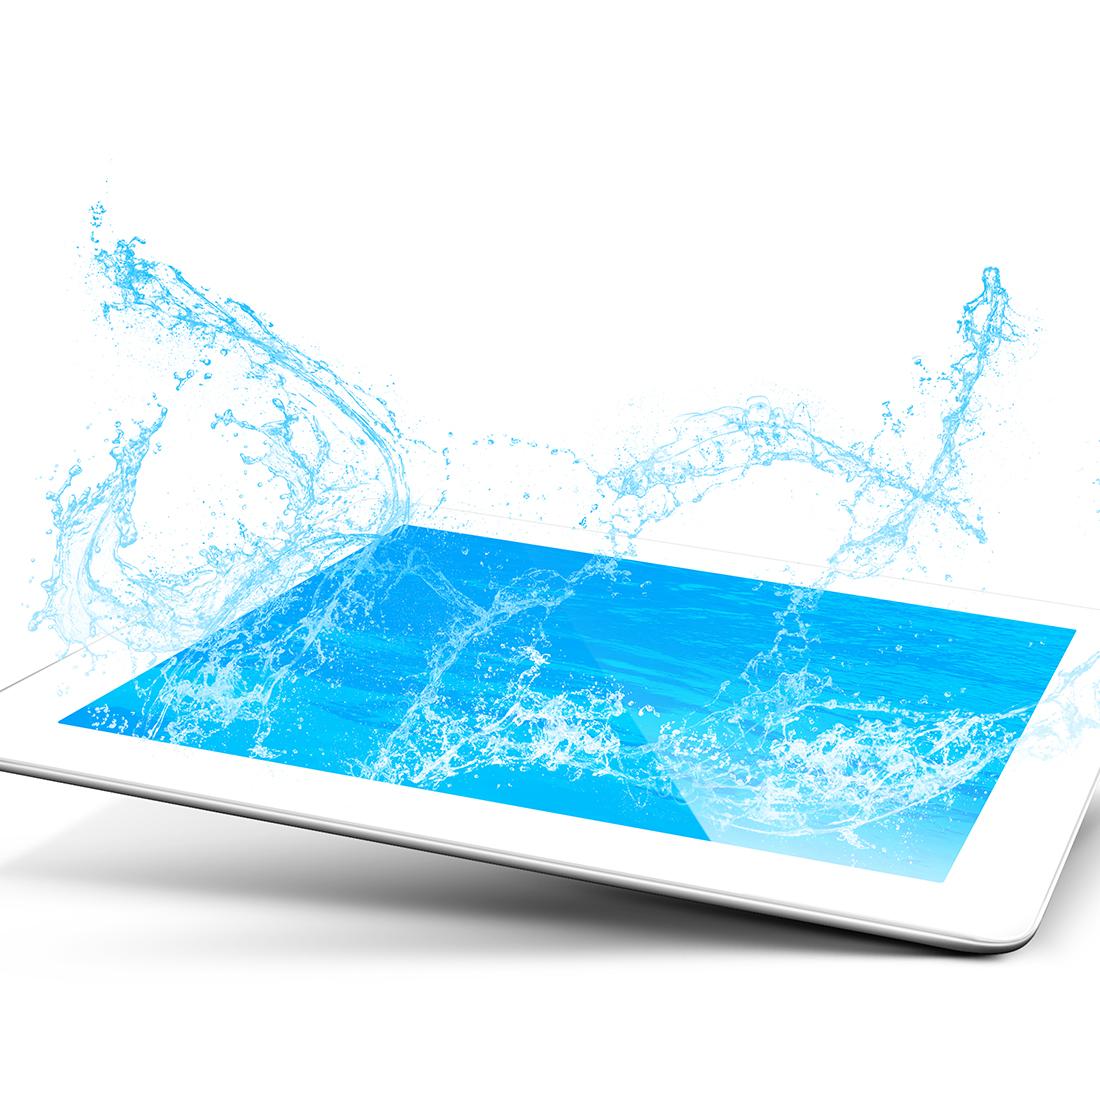 Pool water chemistry calculator hayward poolside blog - Swimming pool evaporation rate calculator ...